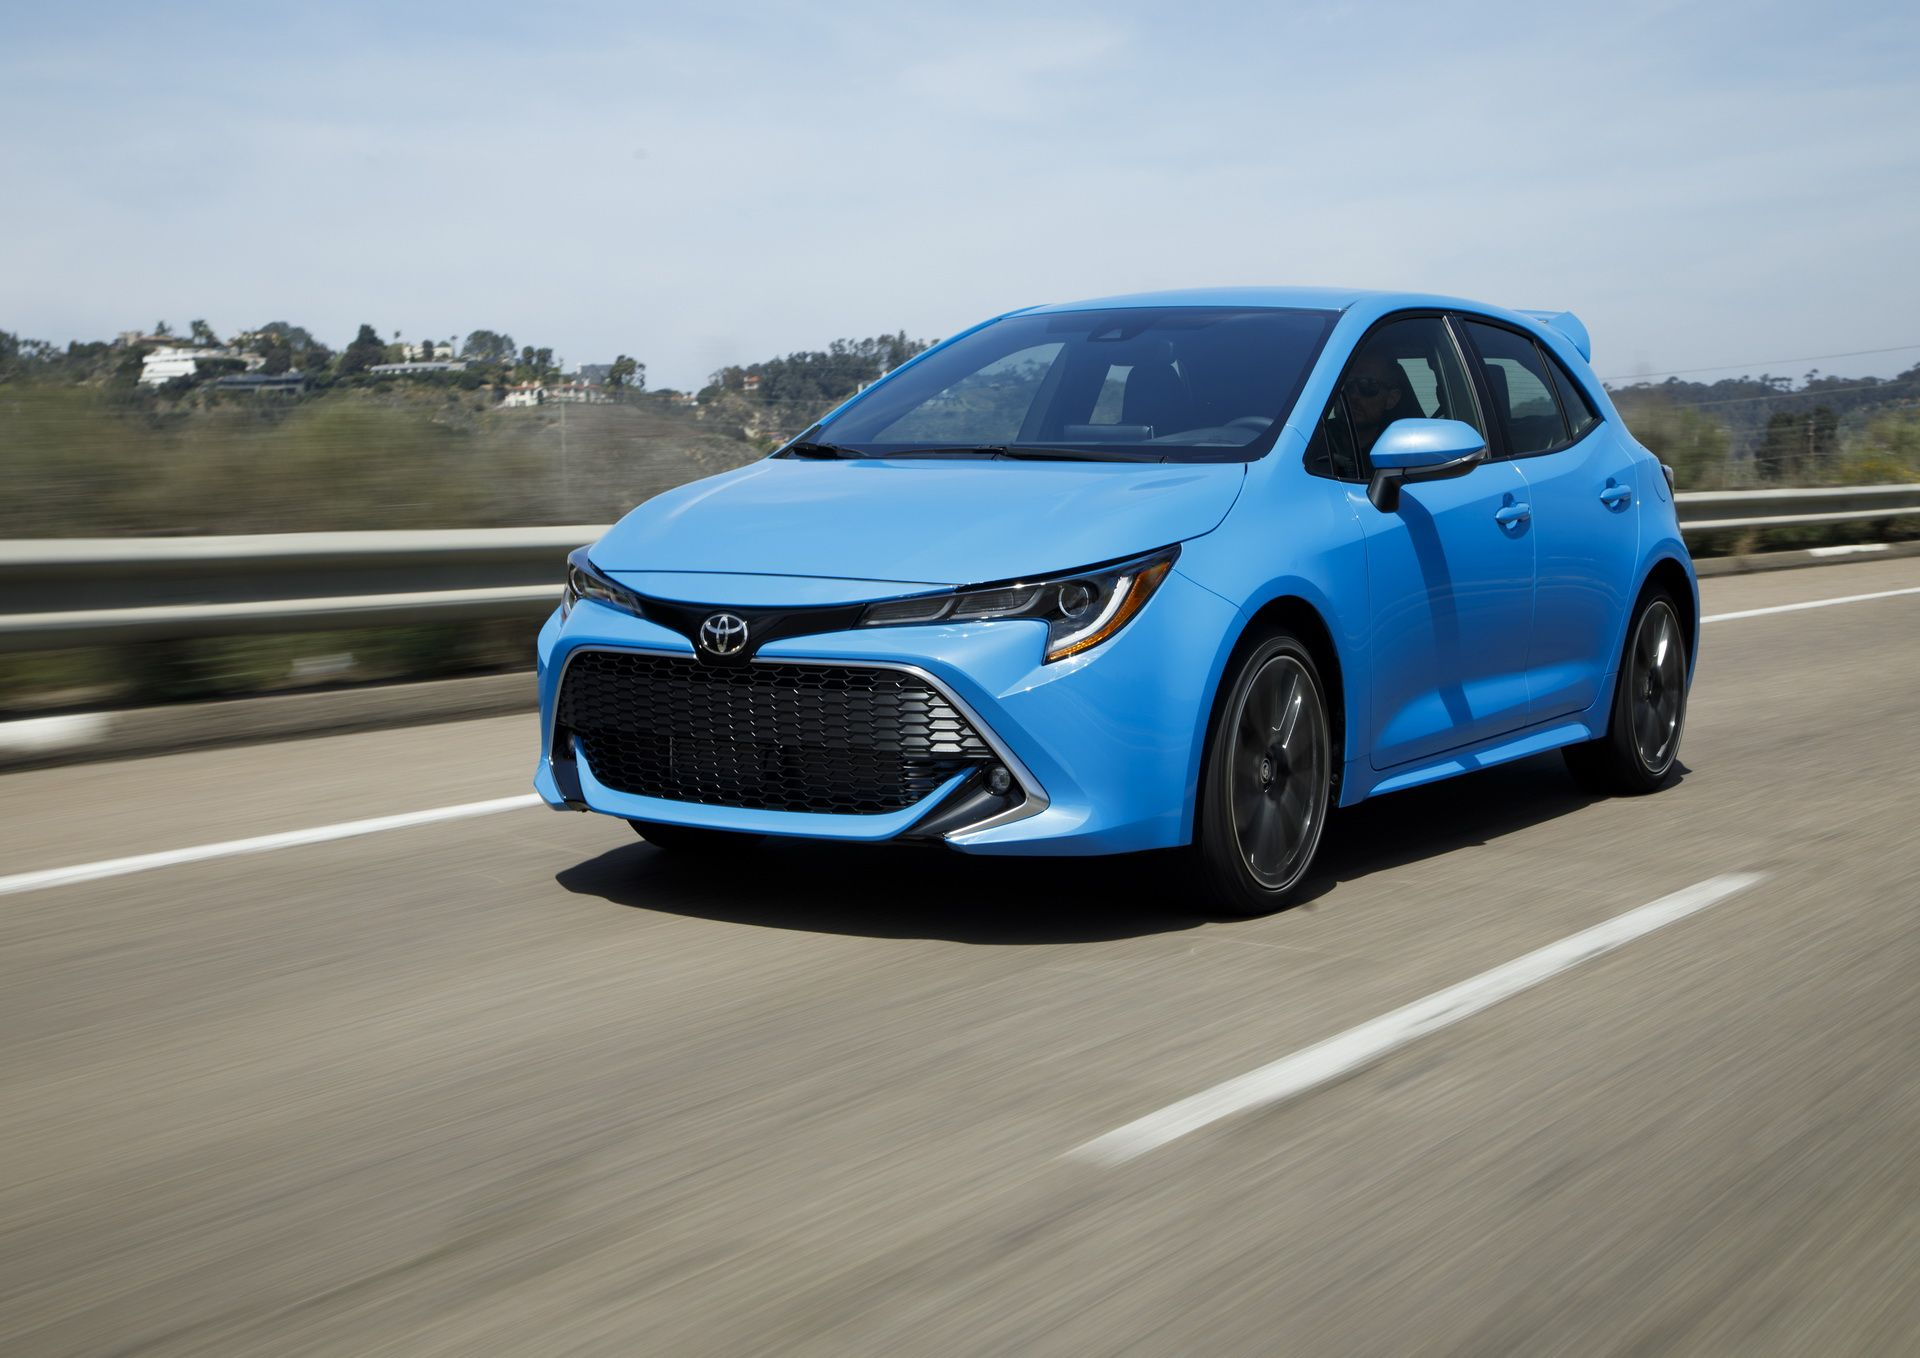 New Toyota Auris Renamed 2019 Toyota Corolla Hatchback